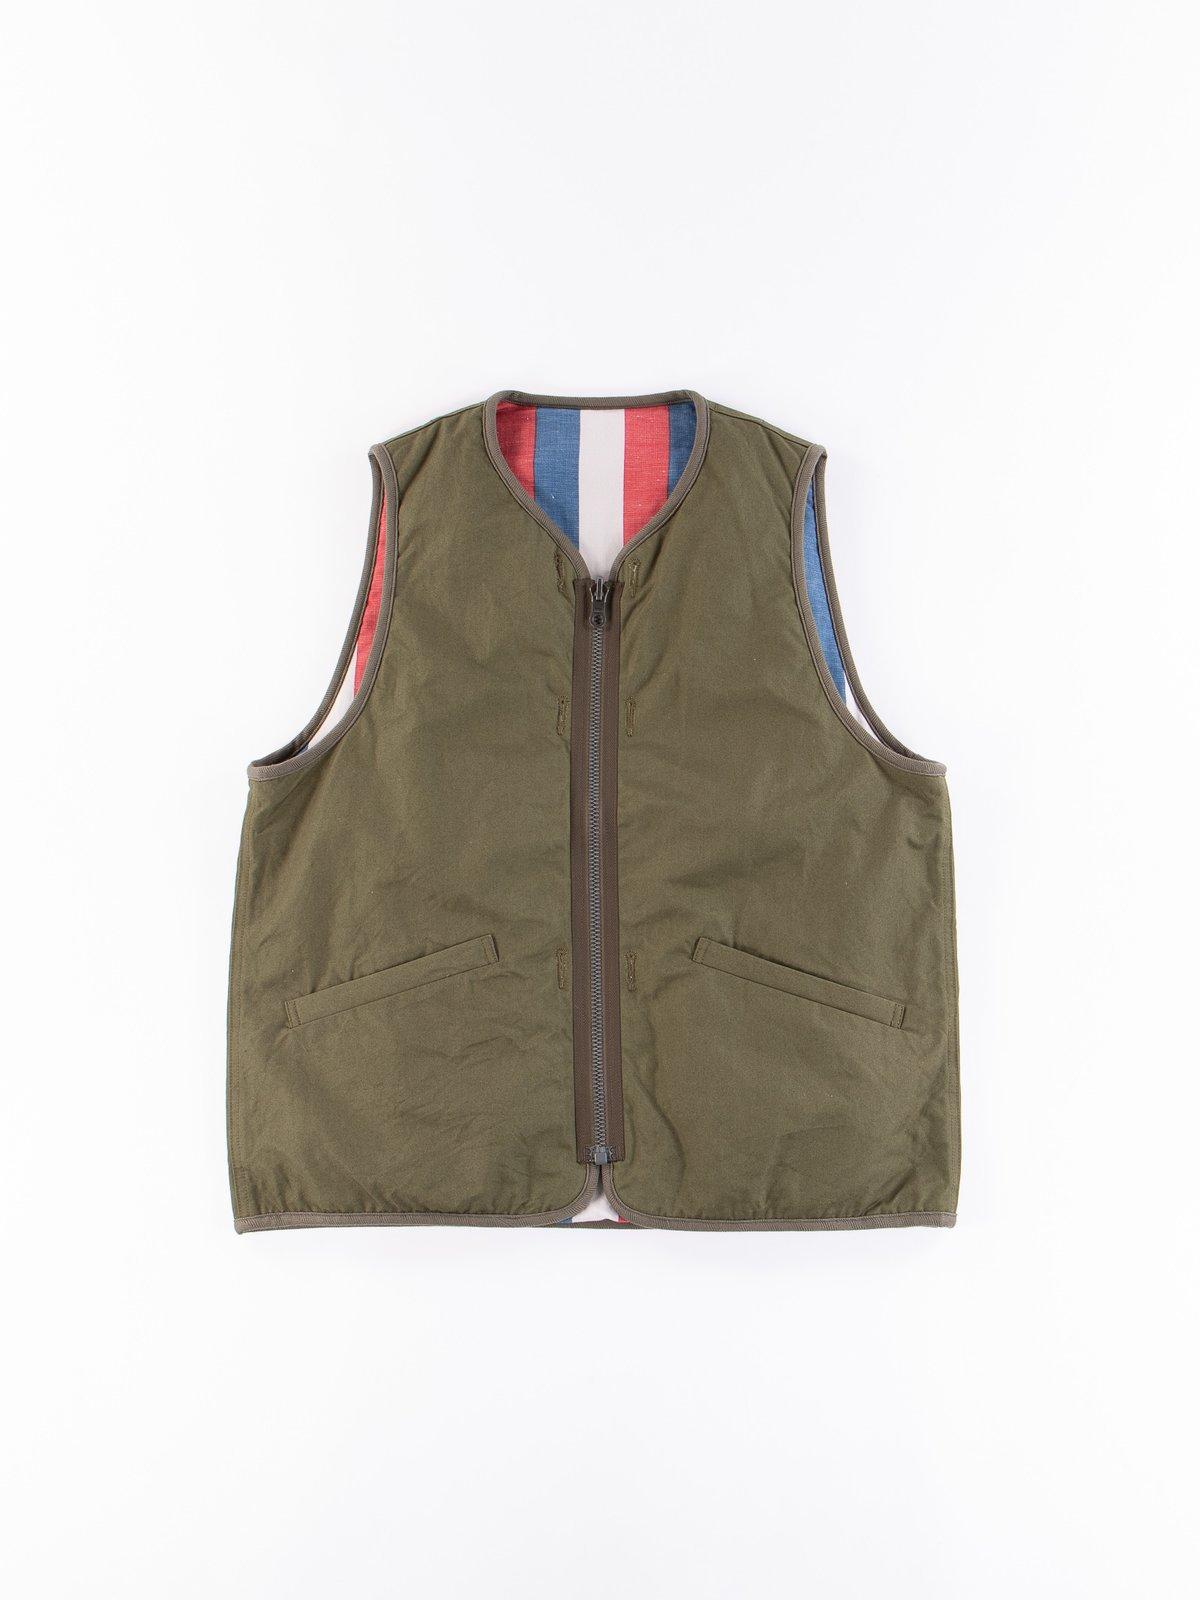 Olive Iris Cotton Liner Vest - Image 1